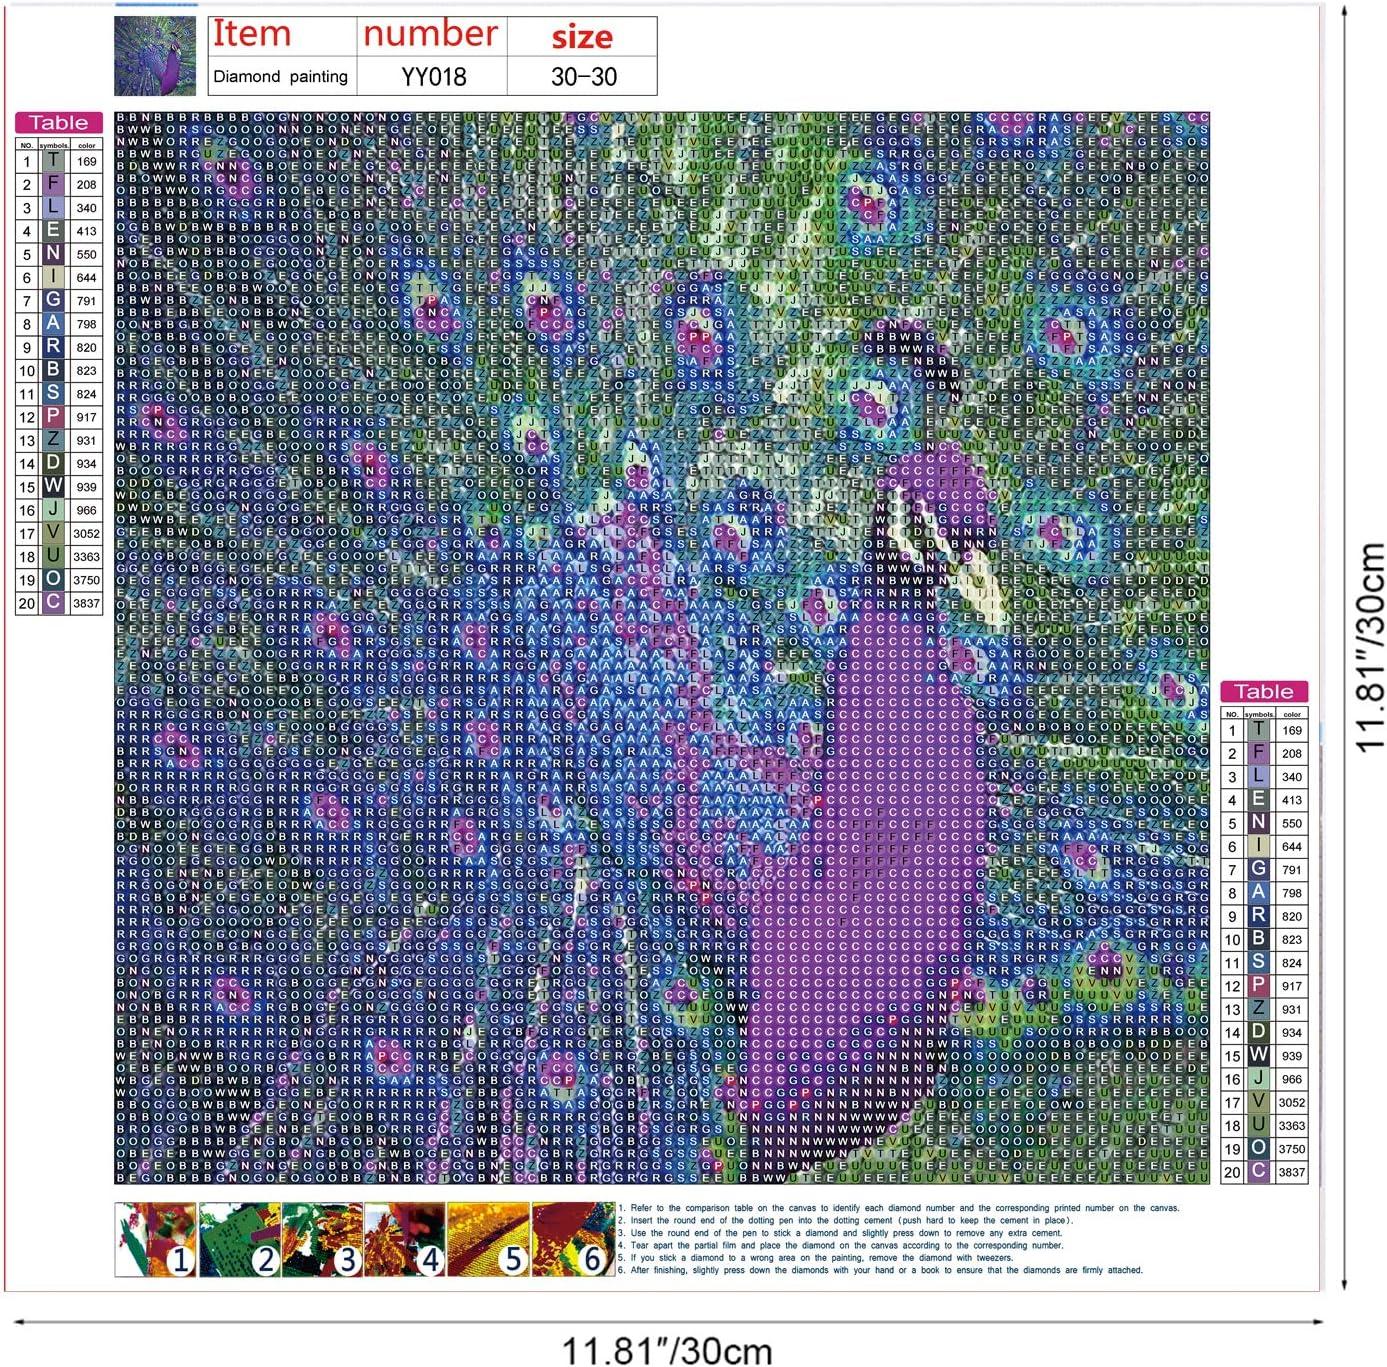 MWOOT DIY 5D Diamond Painting Ricamo a Punto Croce con Strass,Pittura Diamante 5D Fai da Te,Craft Arts per Home Parete Pittura Decor 30x30cm -Pavone